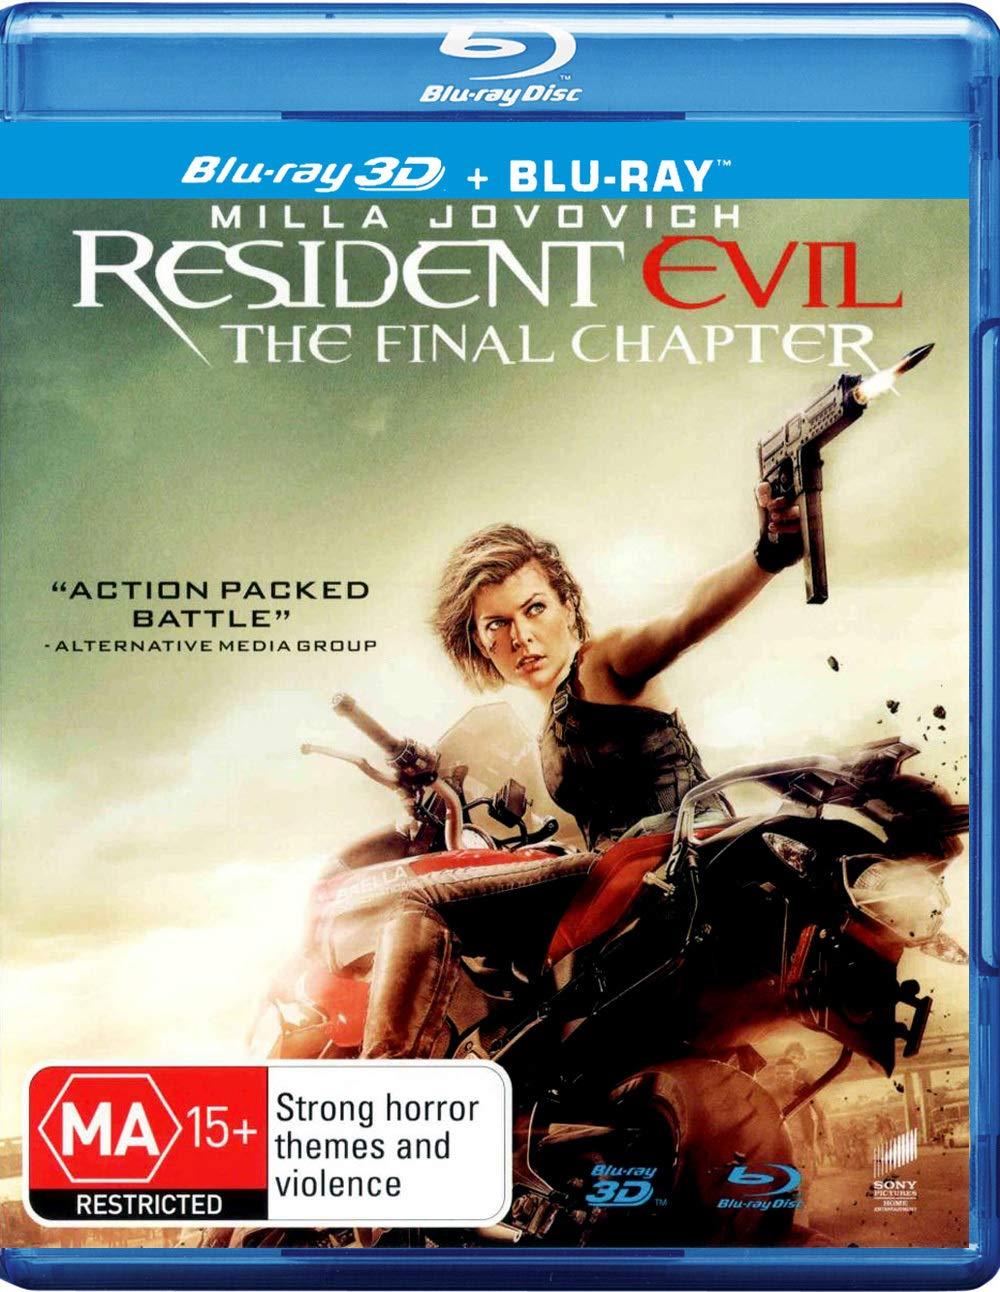 Resident Evil: The Final Chapter 3D/Bd Uv Edizione: Australia ...